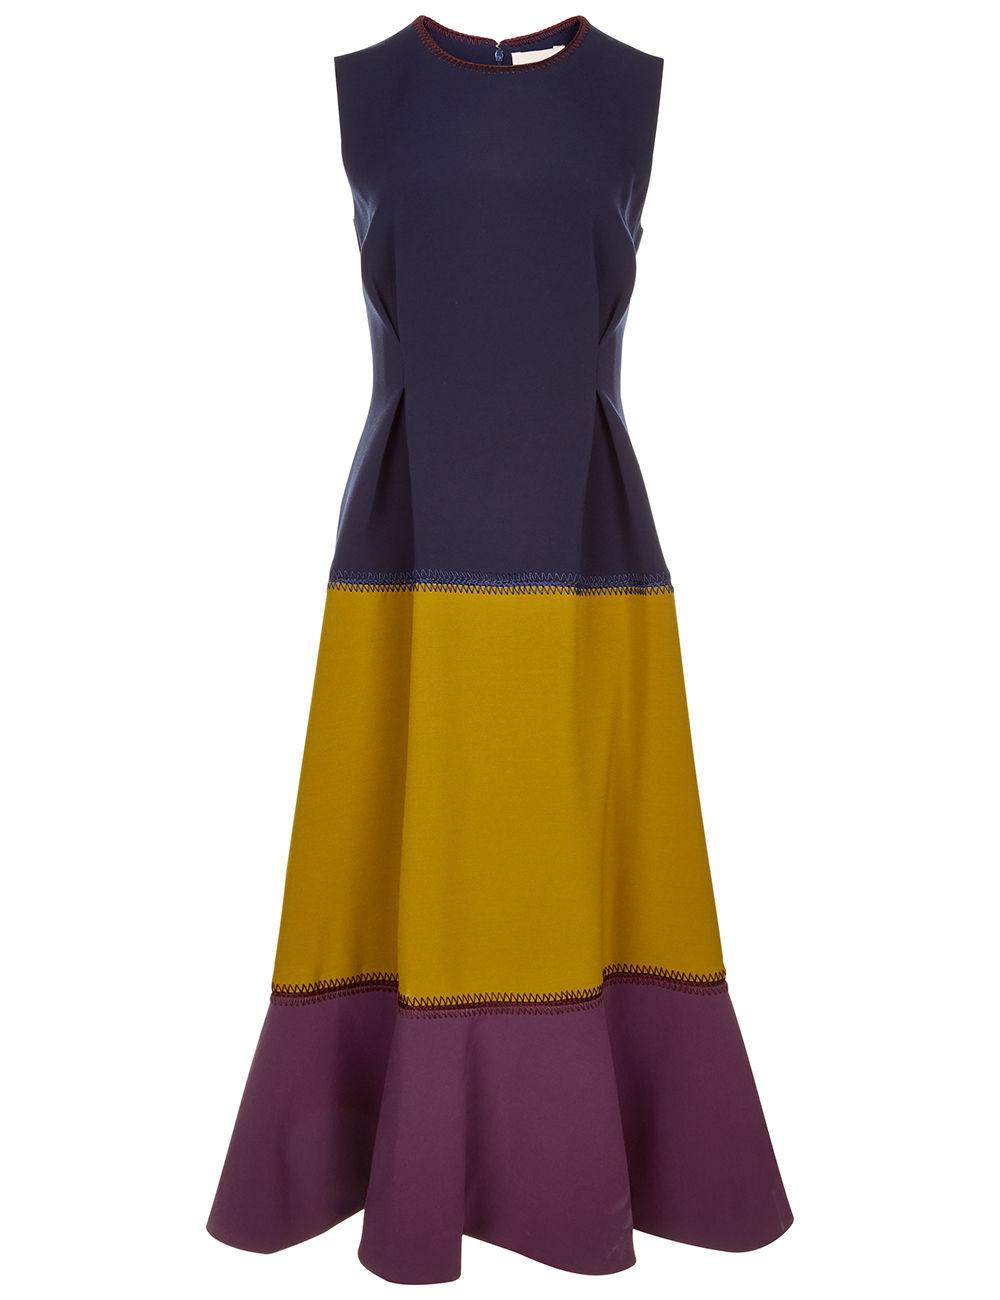 ROKSANDA Ambreen Paneled Stretch-Cady Midi Dress at AVENUE 32